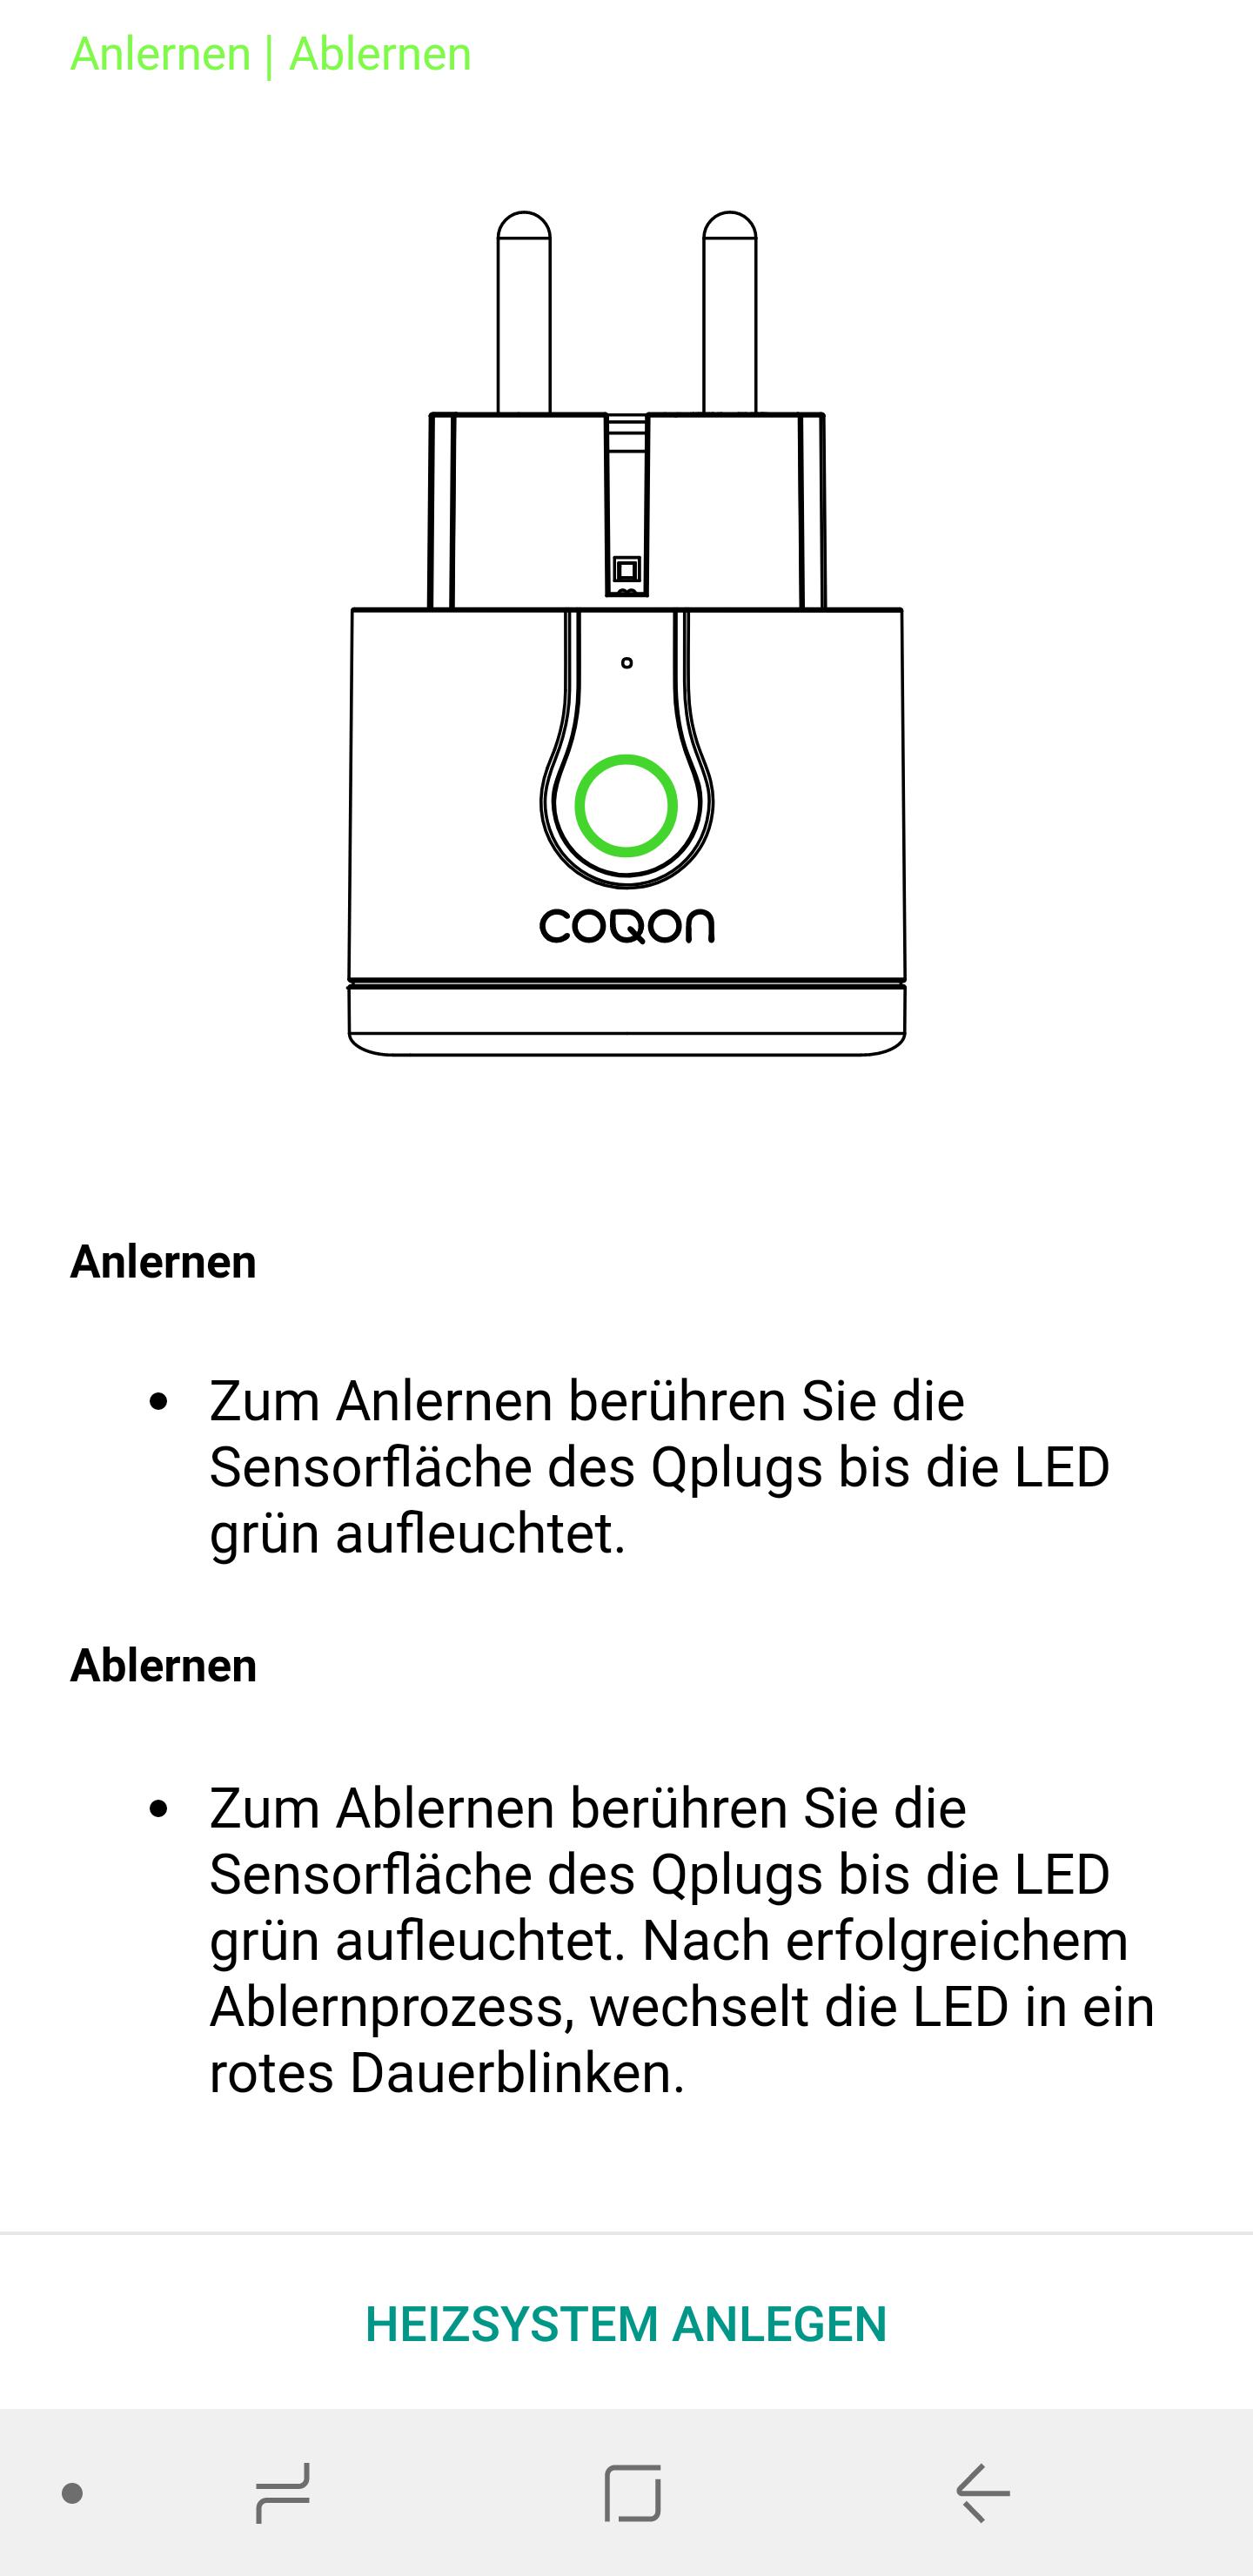 COQON-Gerät-anlernen-4